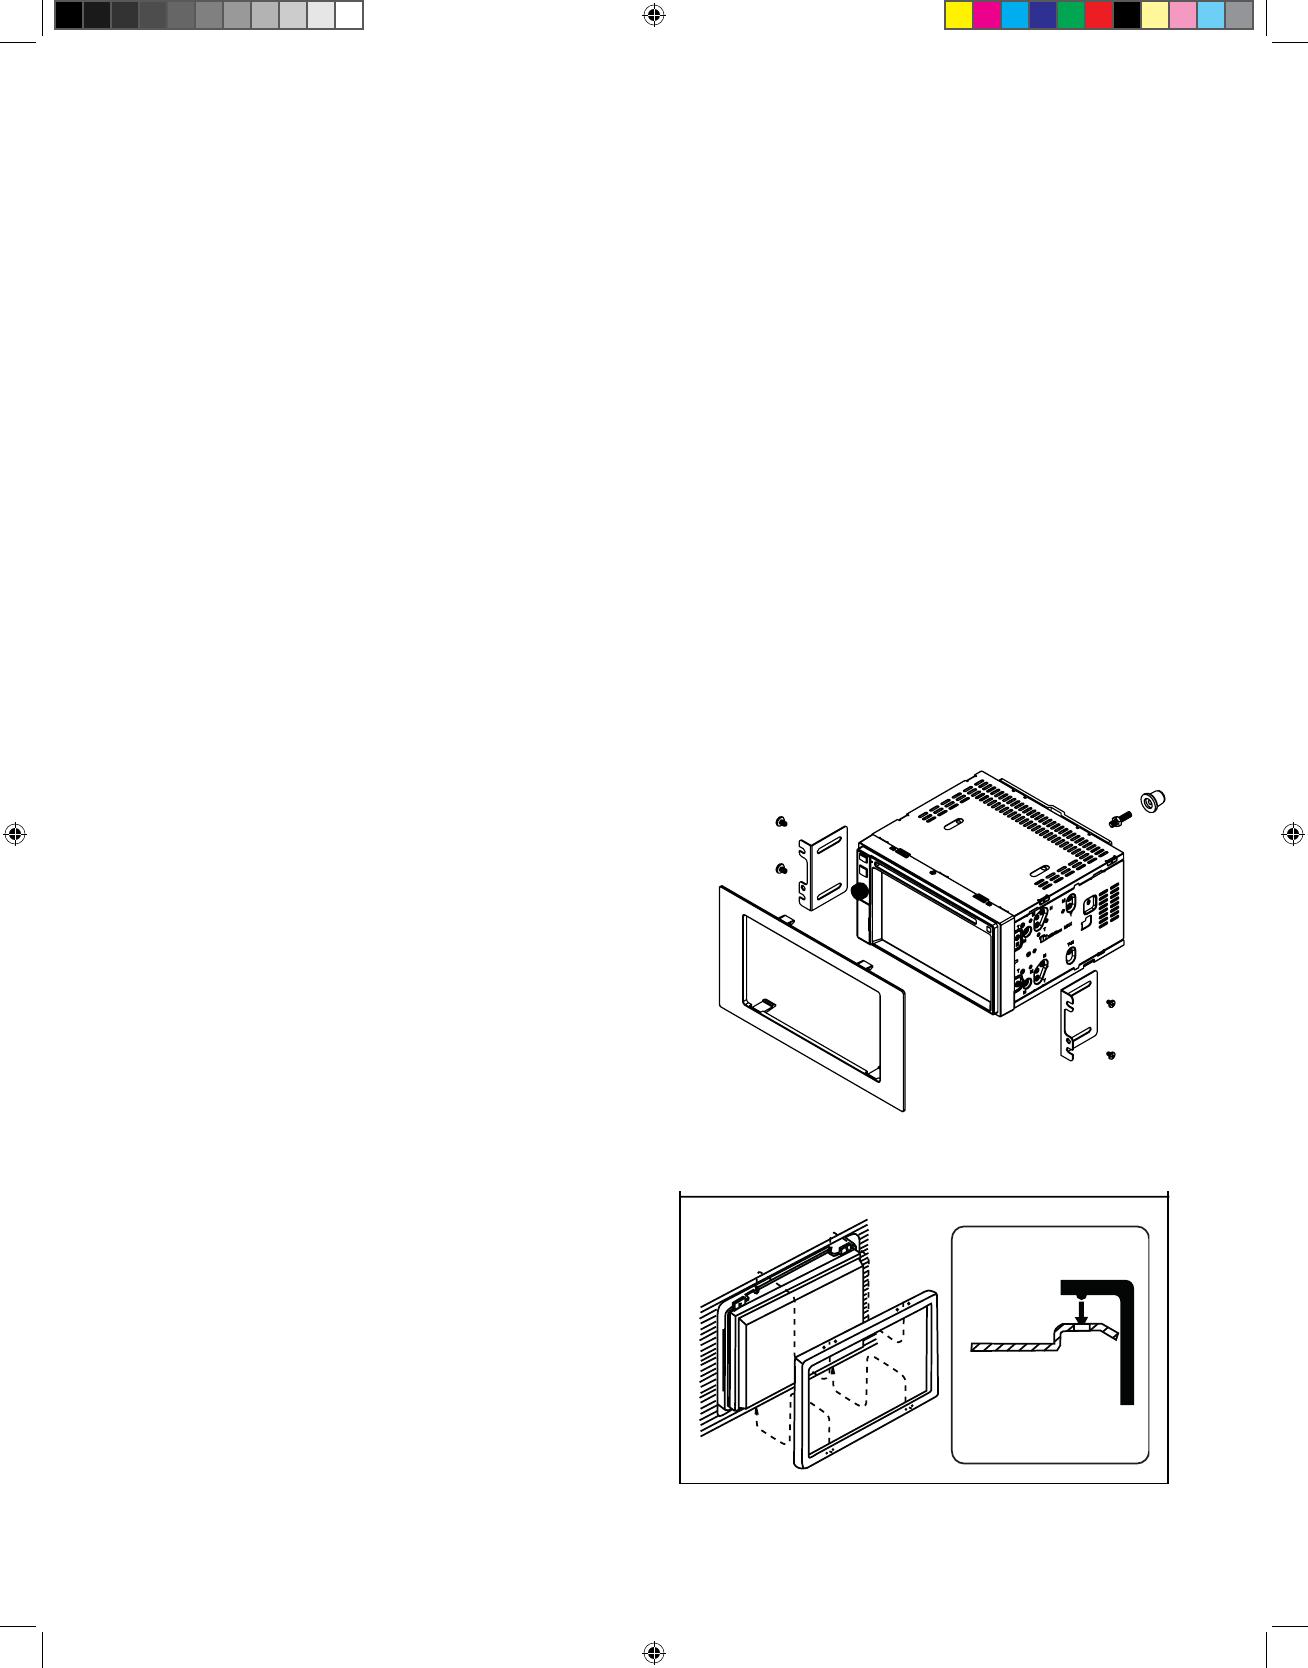 Jensen VX 4025 Installation Quick Start Guide VX4025 IM EN on equalizer circuit diagram, car audio diagram, equalizer and amp diagram, equalizer amp wiring, equalizer schematic,